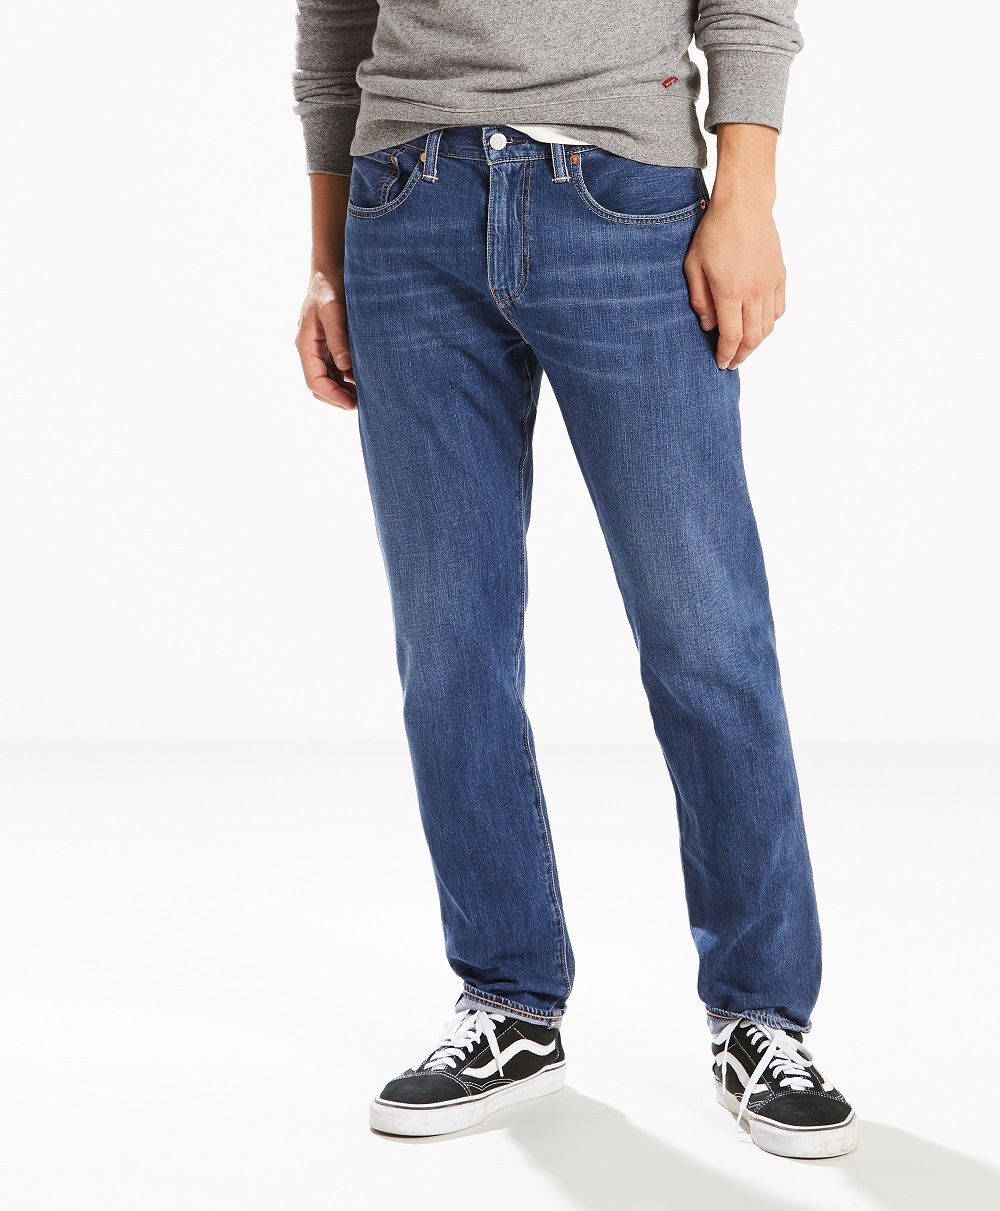 f2bafd64747 Levis pánské džíny 29507-0120 Modrá W31 L32